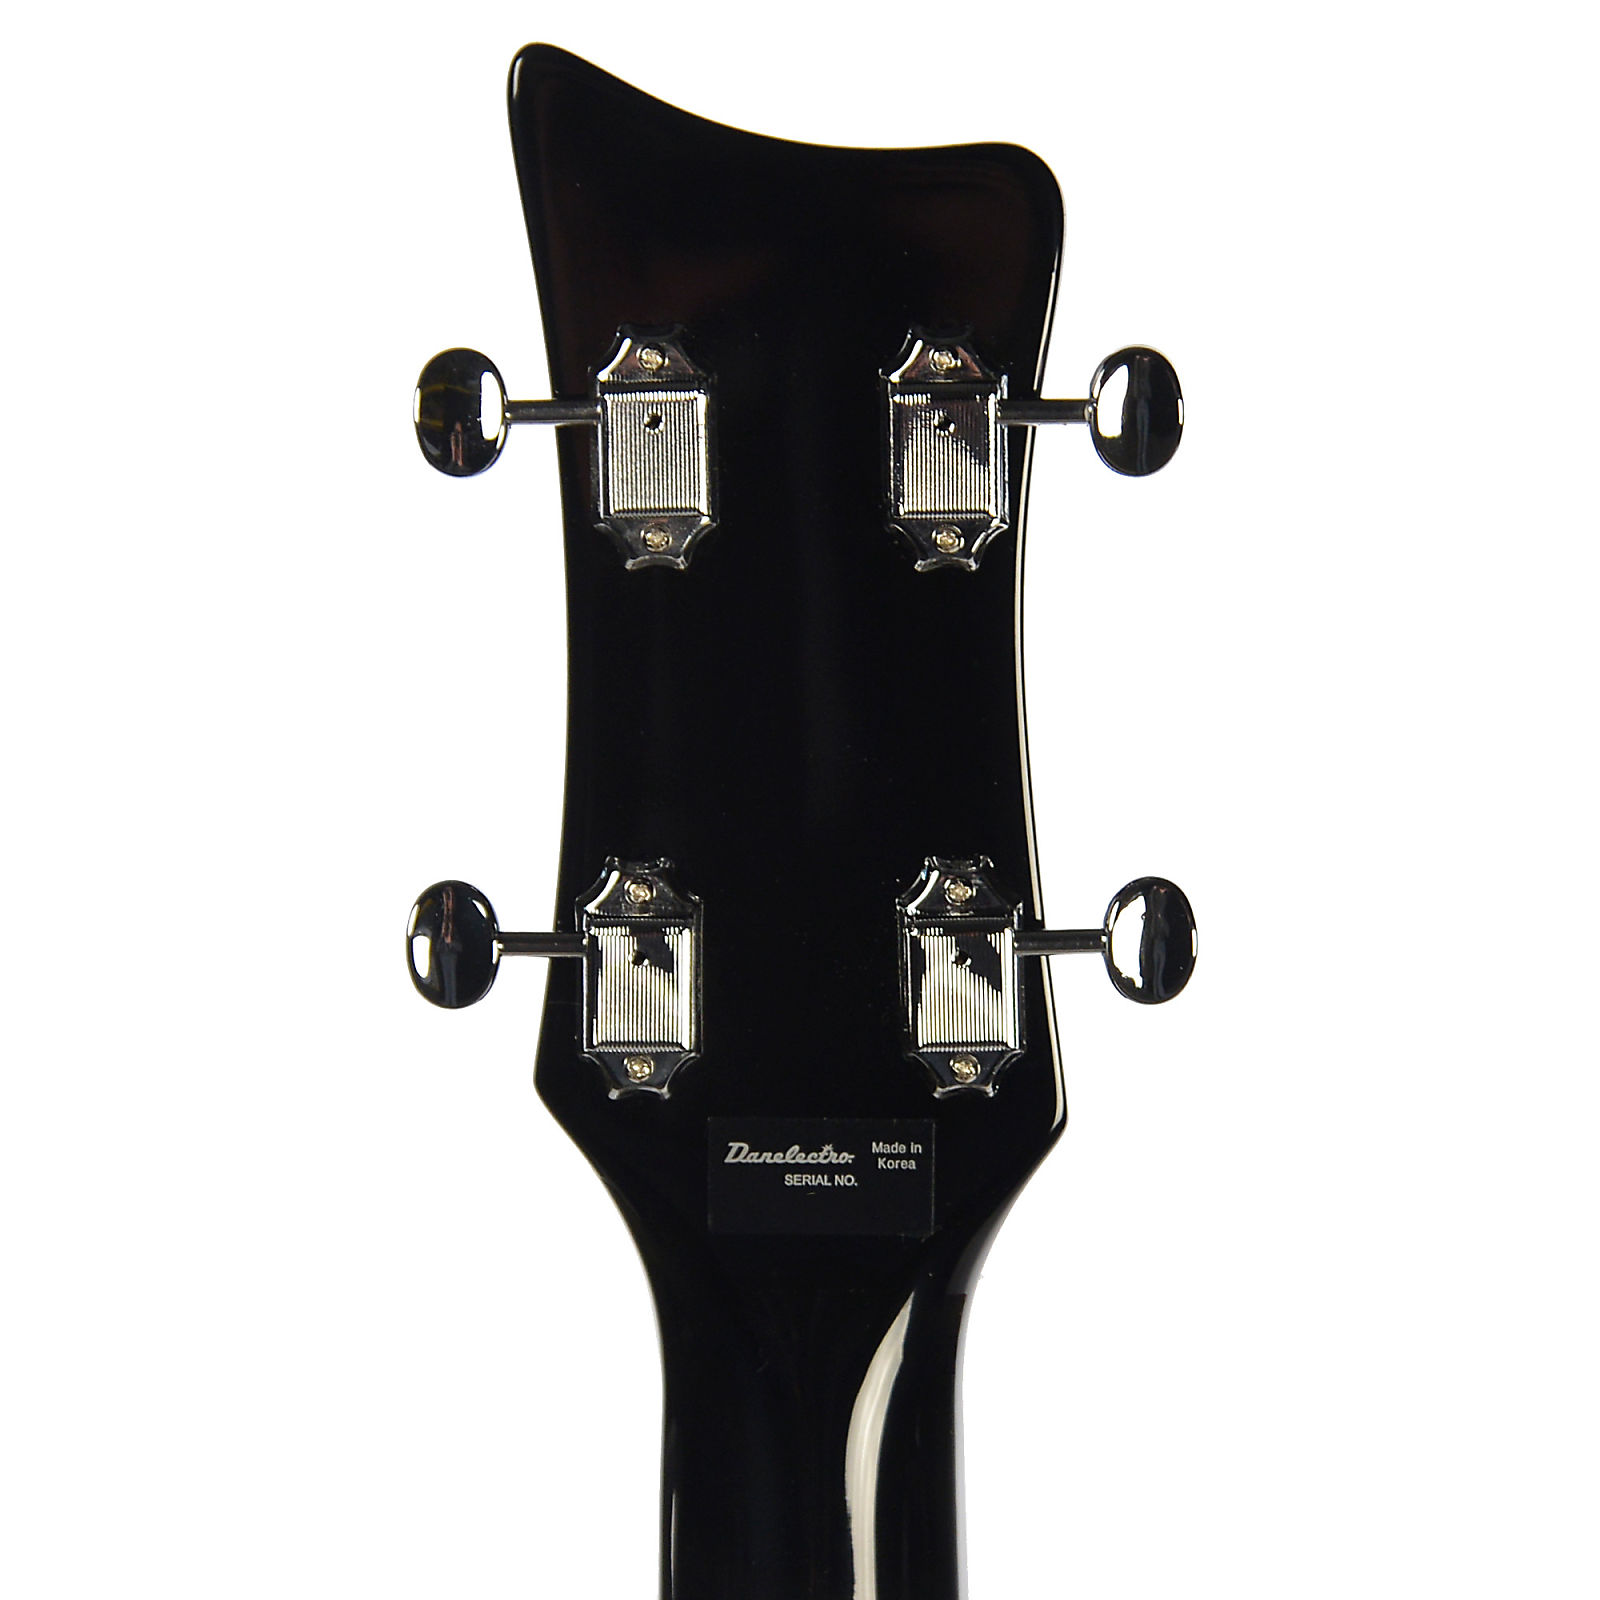 Danelectro D64 Bass 3 Tone Sunburst